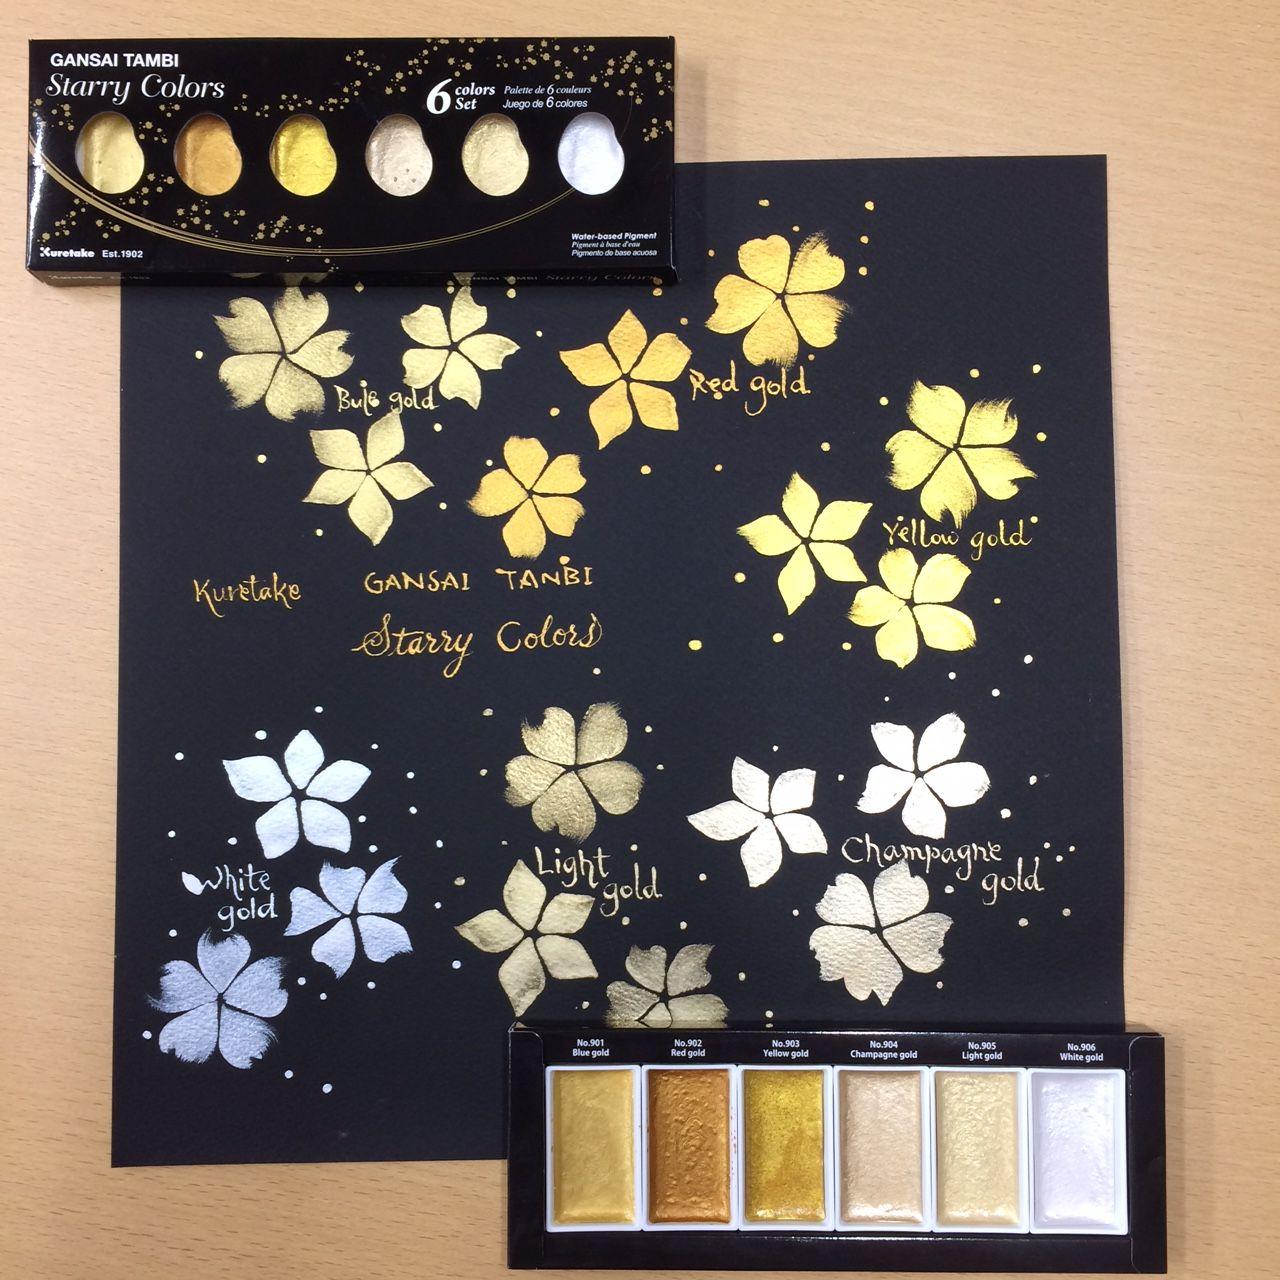 Gansai Tambi Starry Colors Golden Pearl Tinted Gansai For